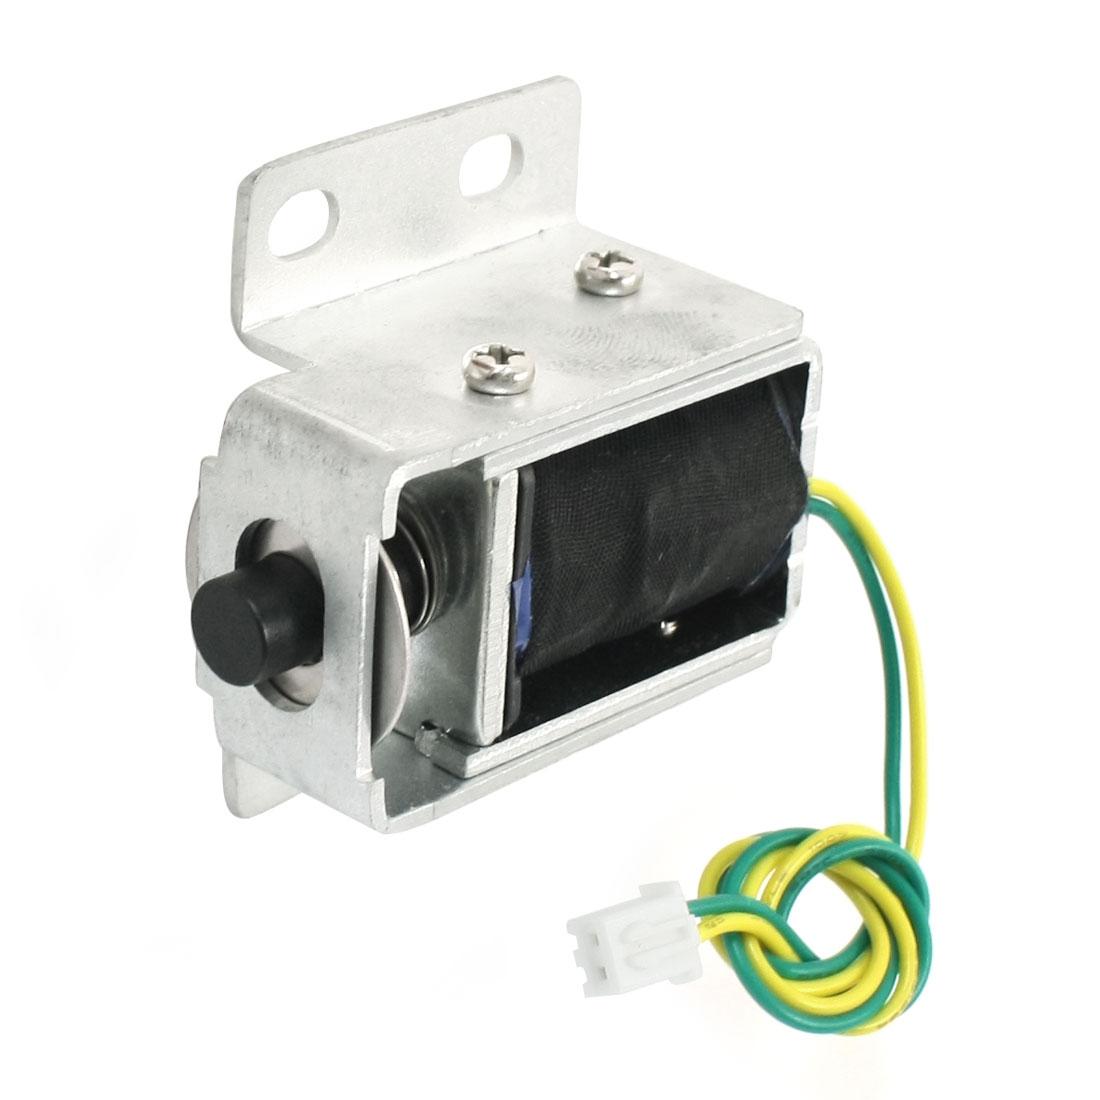 6V 0.3A 2mm 200g 4mm 100g Pull Type Opening Frame Spring Plunger Linear DC Solenoid Electromagnet